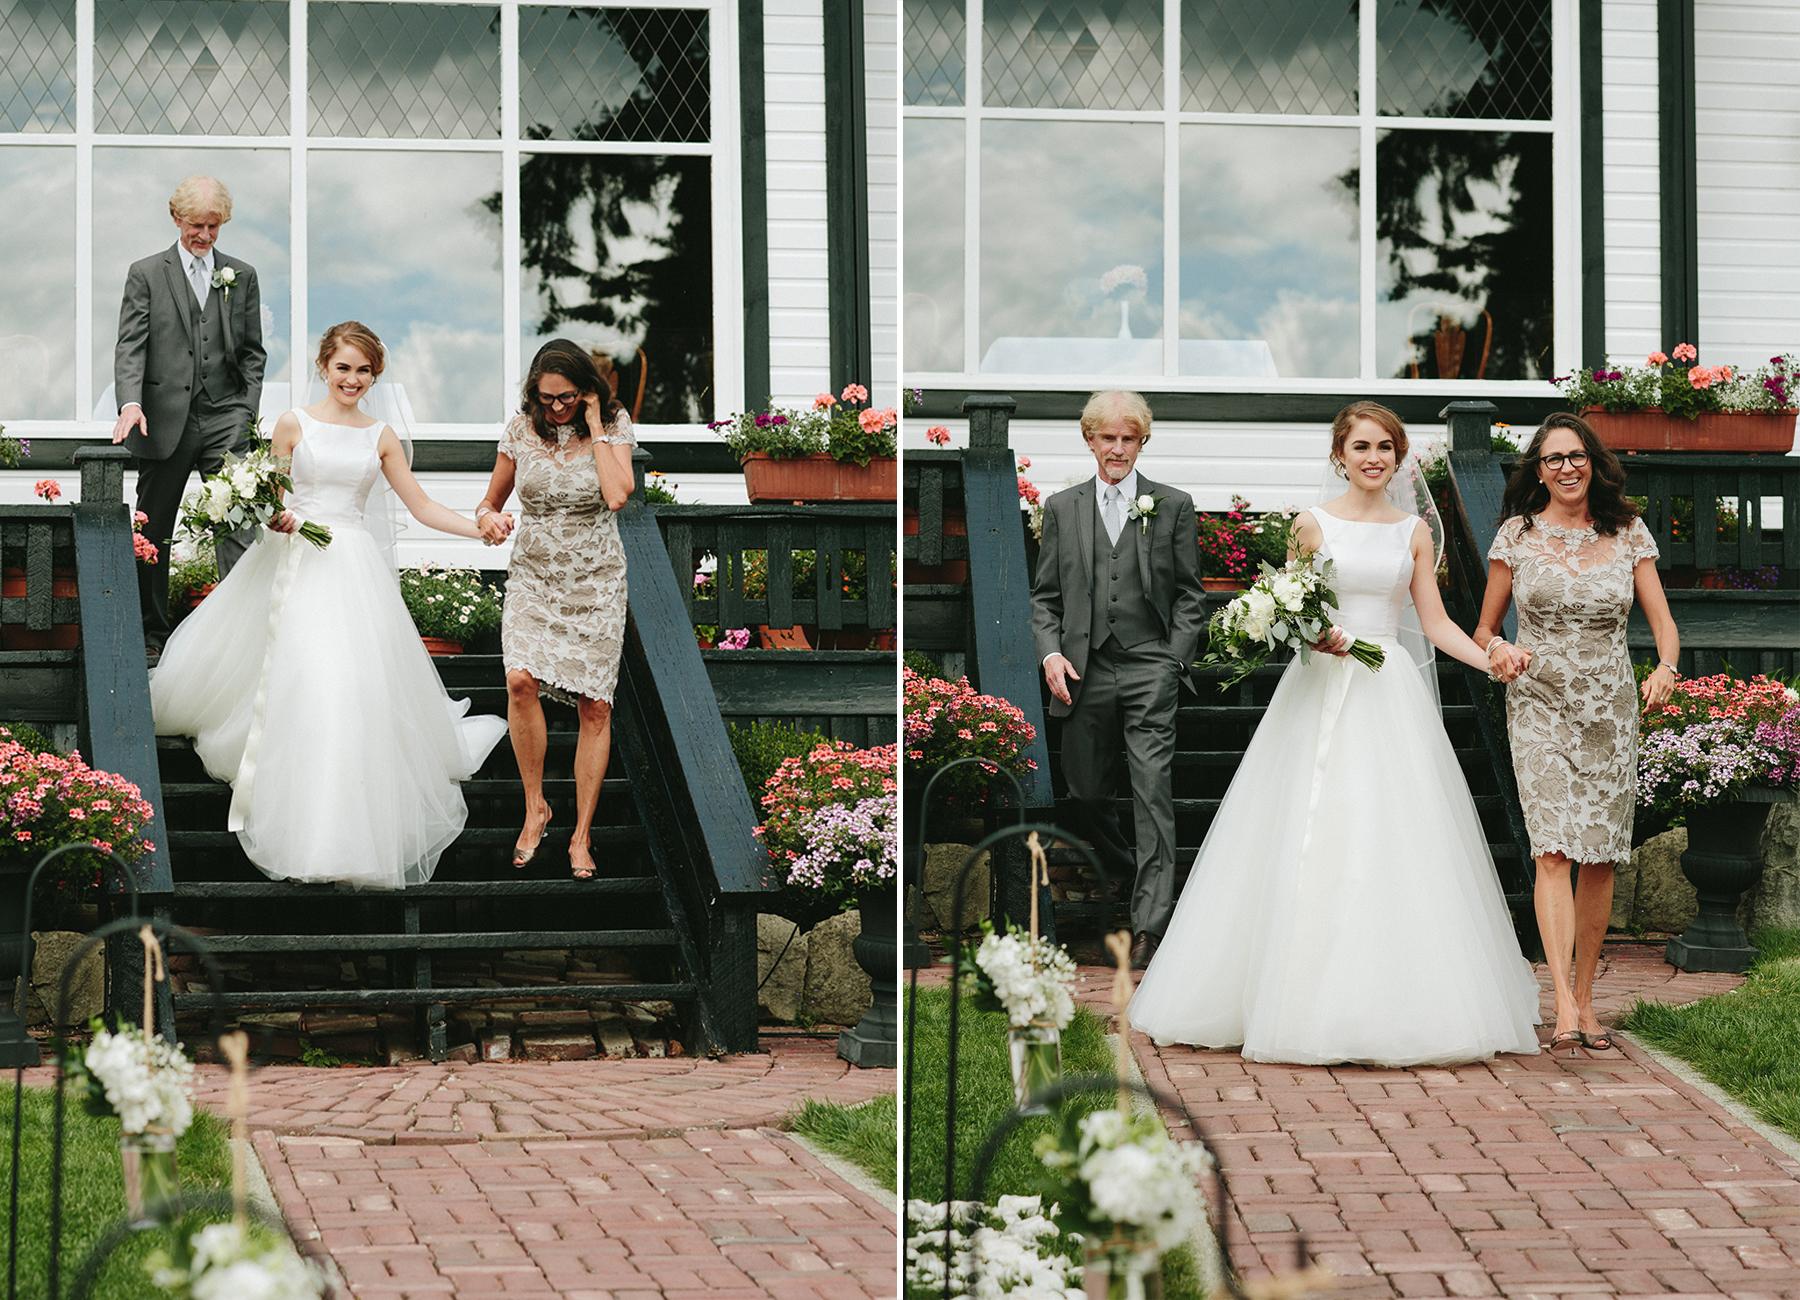 070-thetis-island-wedding-photographer-rp-rn2.jpg